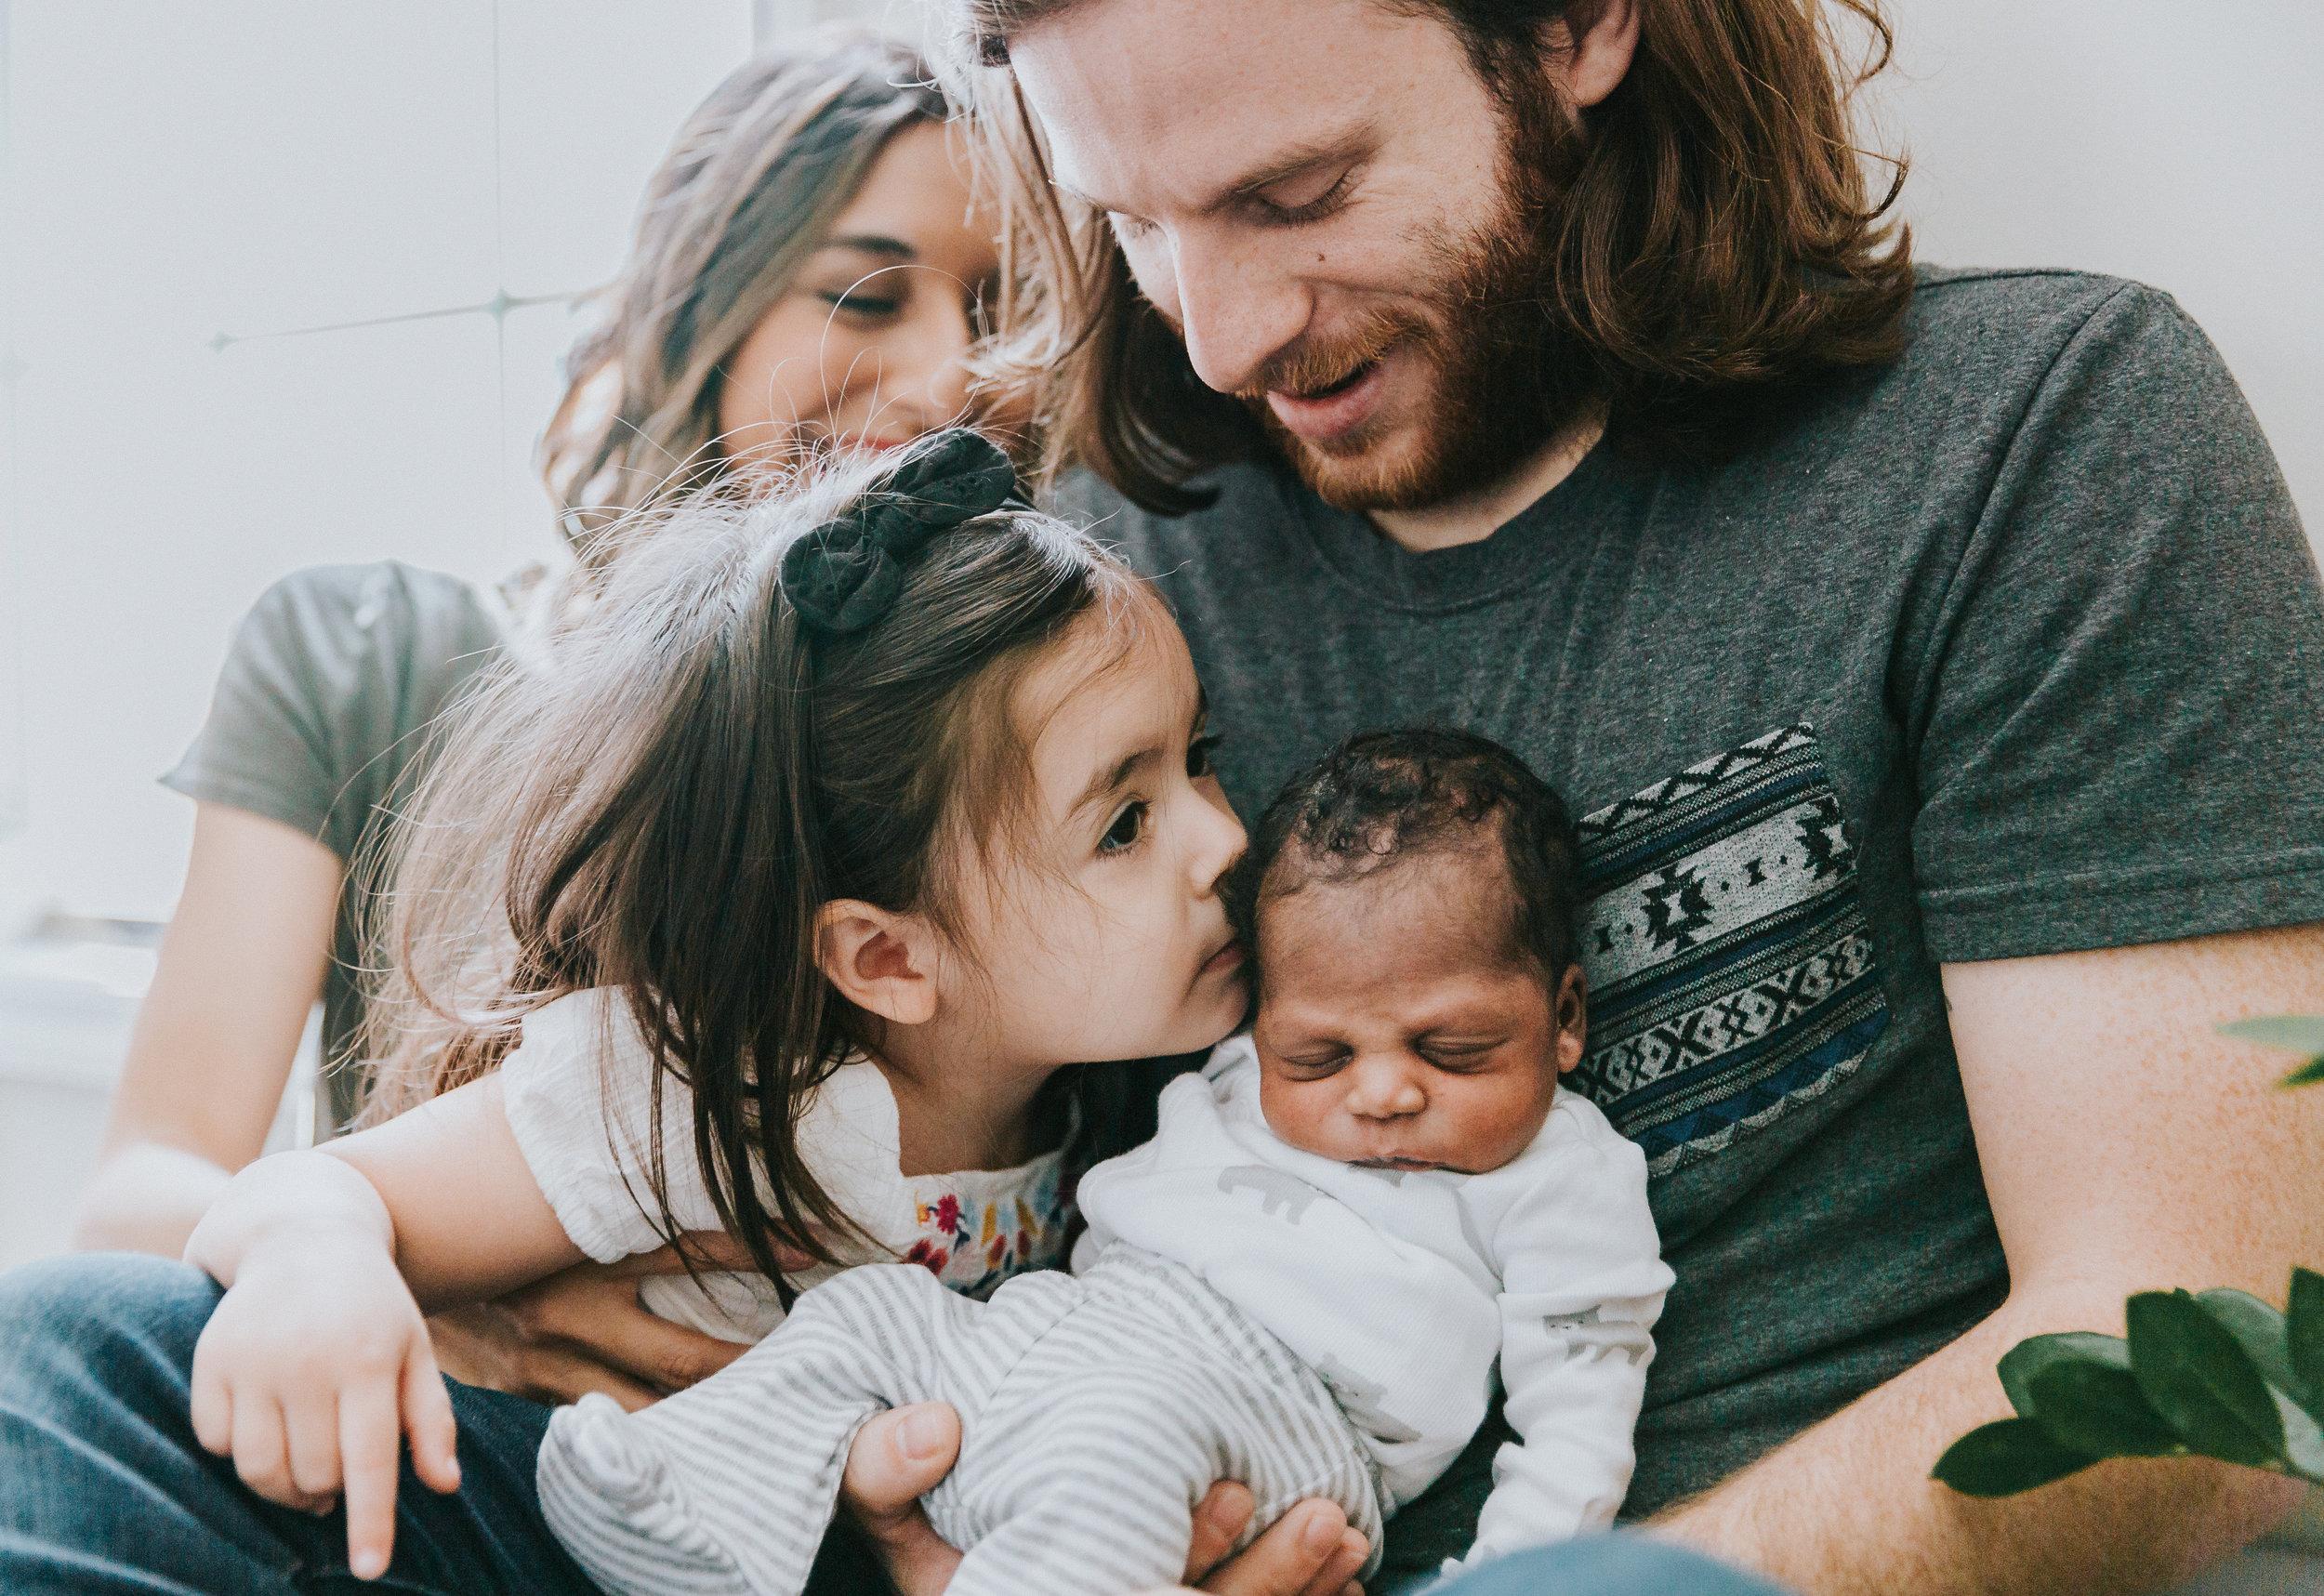 lifestyle-newborn-photographer-nashville-franlin-brentwood-adoption-87.jpg